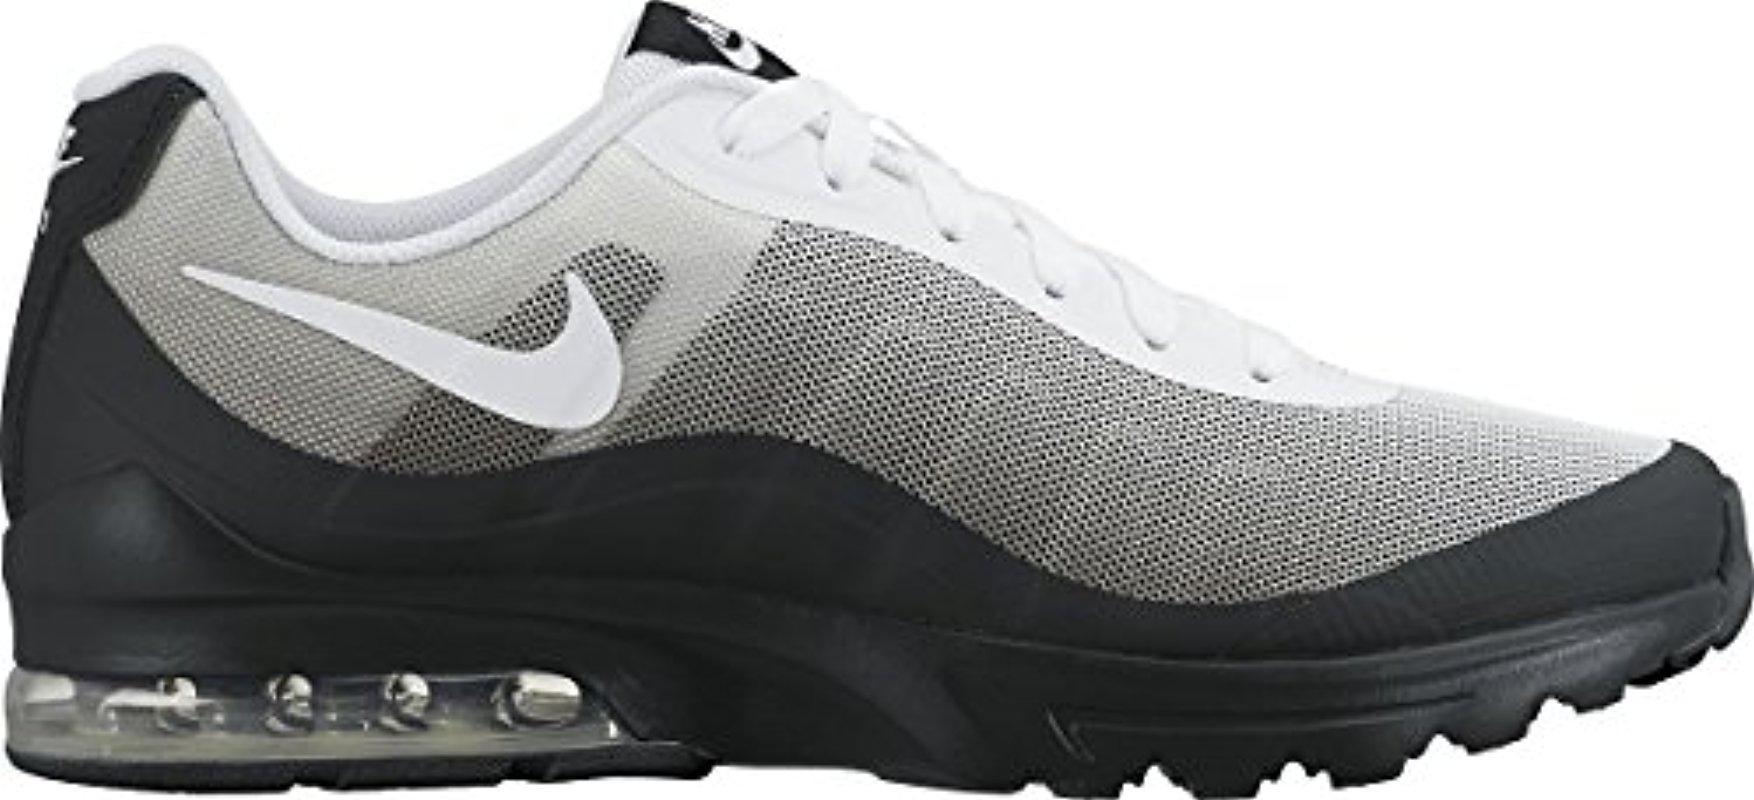 d902bd3e289b81 Lyst - Nike Air Max Invigor Print Running Shoe in Gray for Men